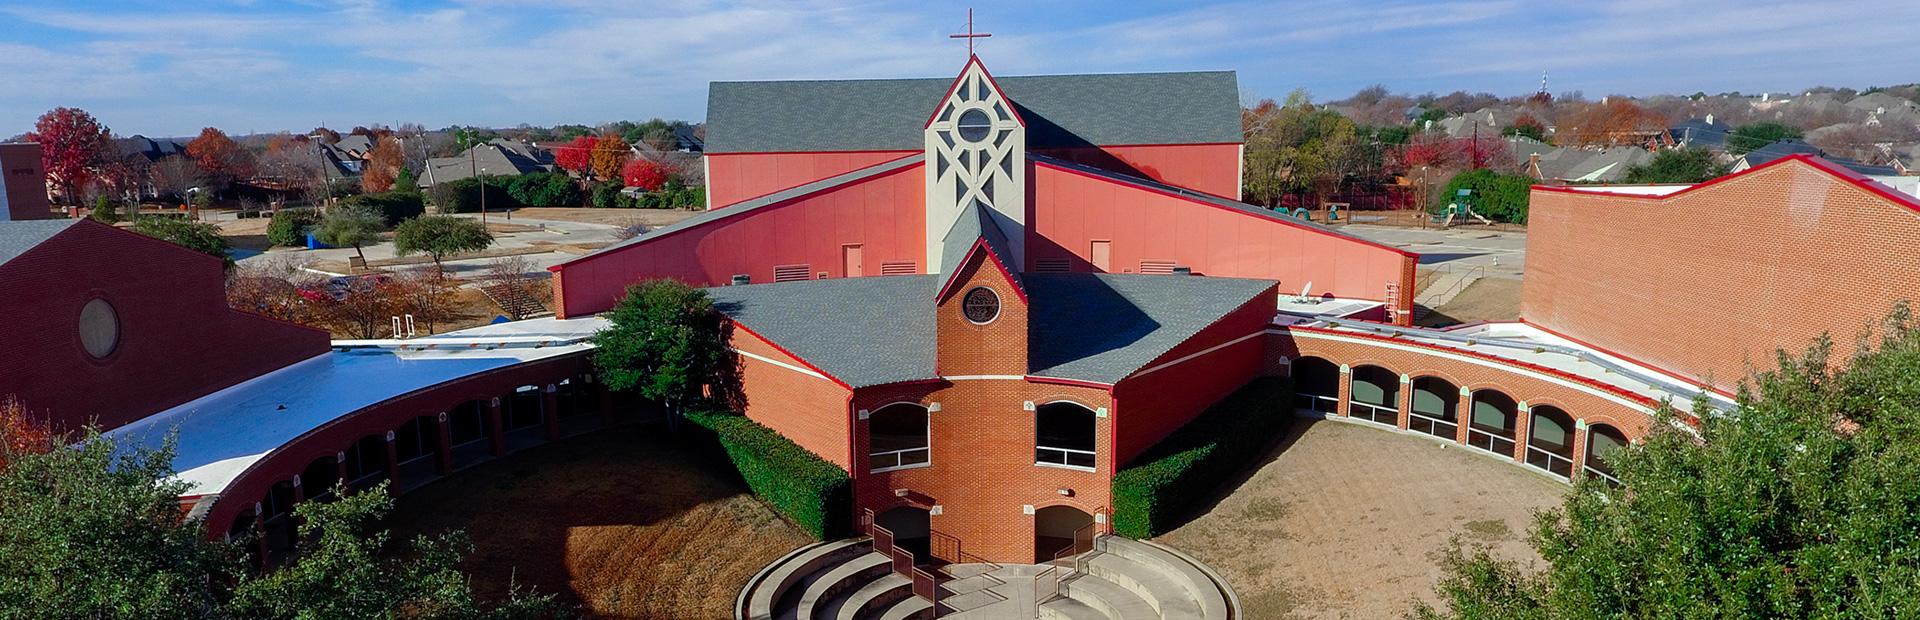 Church Roofing - Dallas Fort Worth & Denton